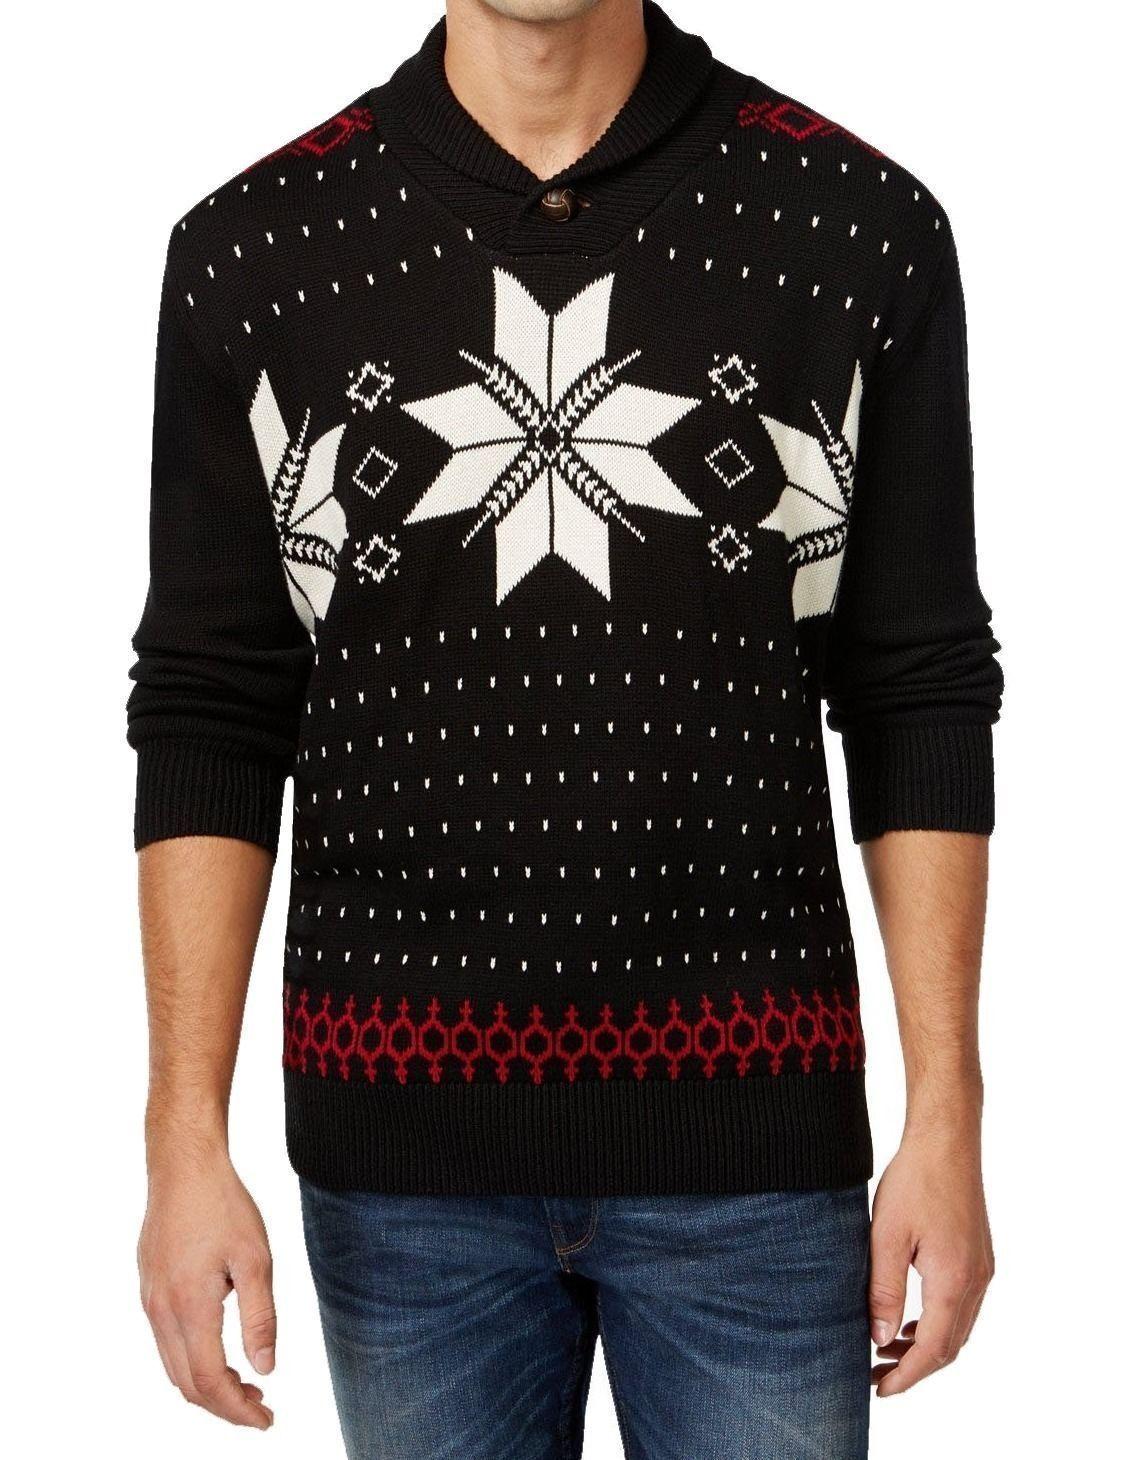 4af84c6448f334 S l1600. S l1600. Previous. Weatherproof Vintage Men's Christmas Sweater  Black Shawl Snowflake Knit Pullover